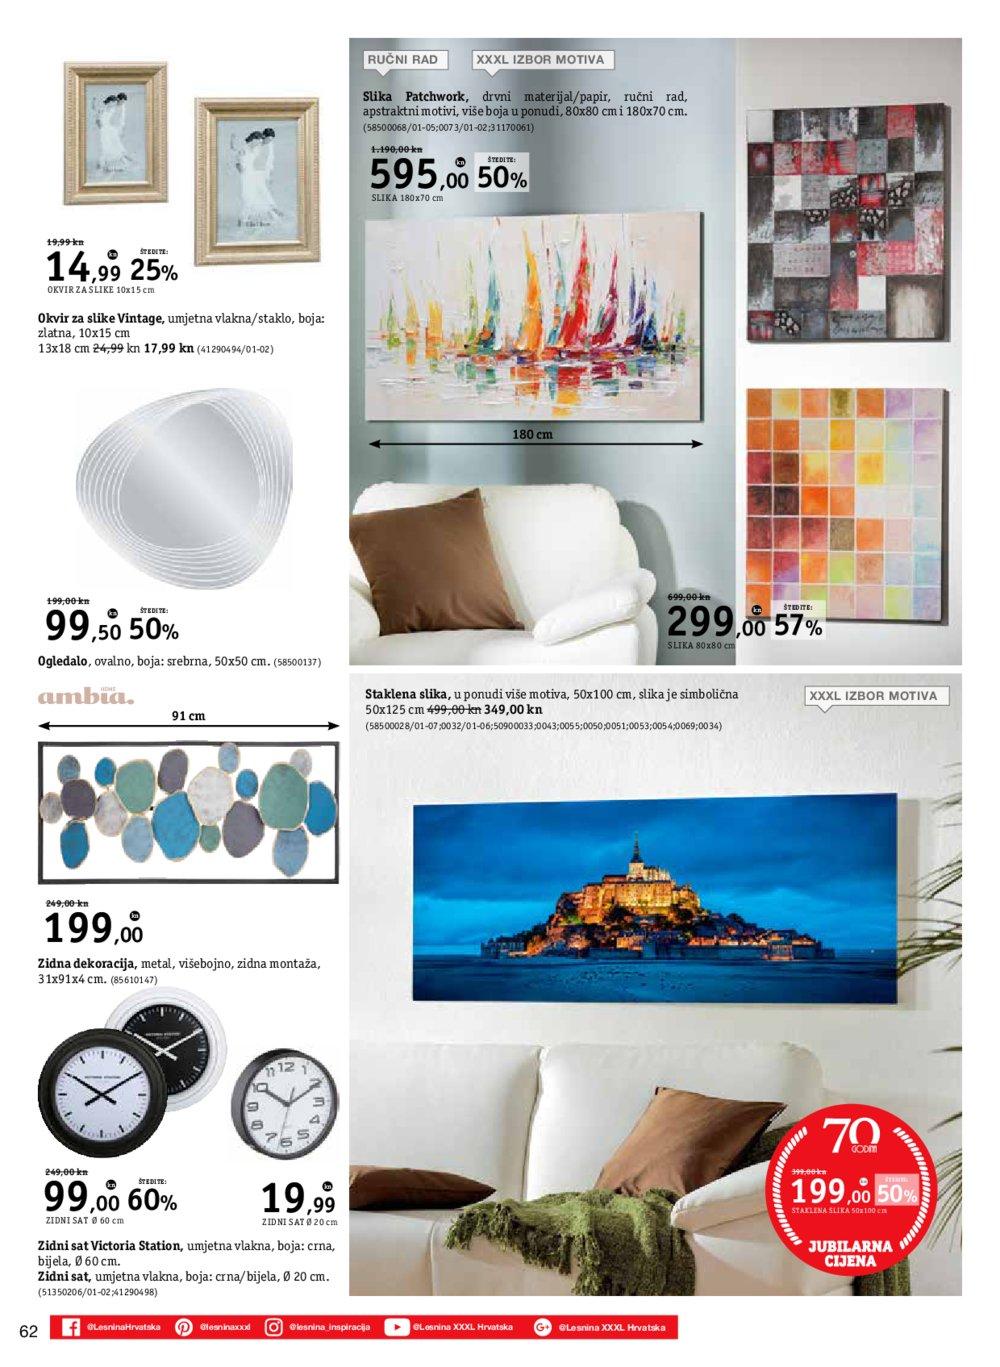 Lesnina katalog XXXL svijet apartmana 19.02.-31.05.2019.